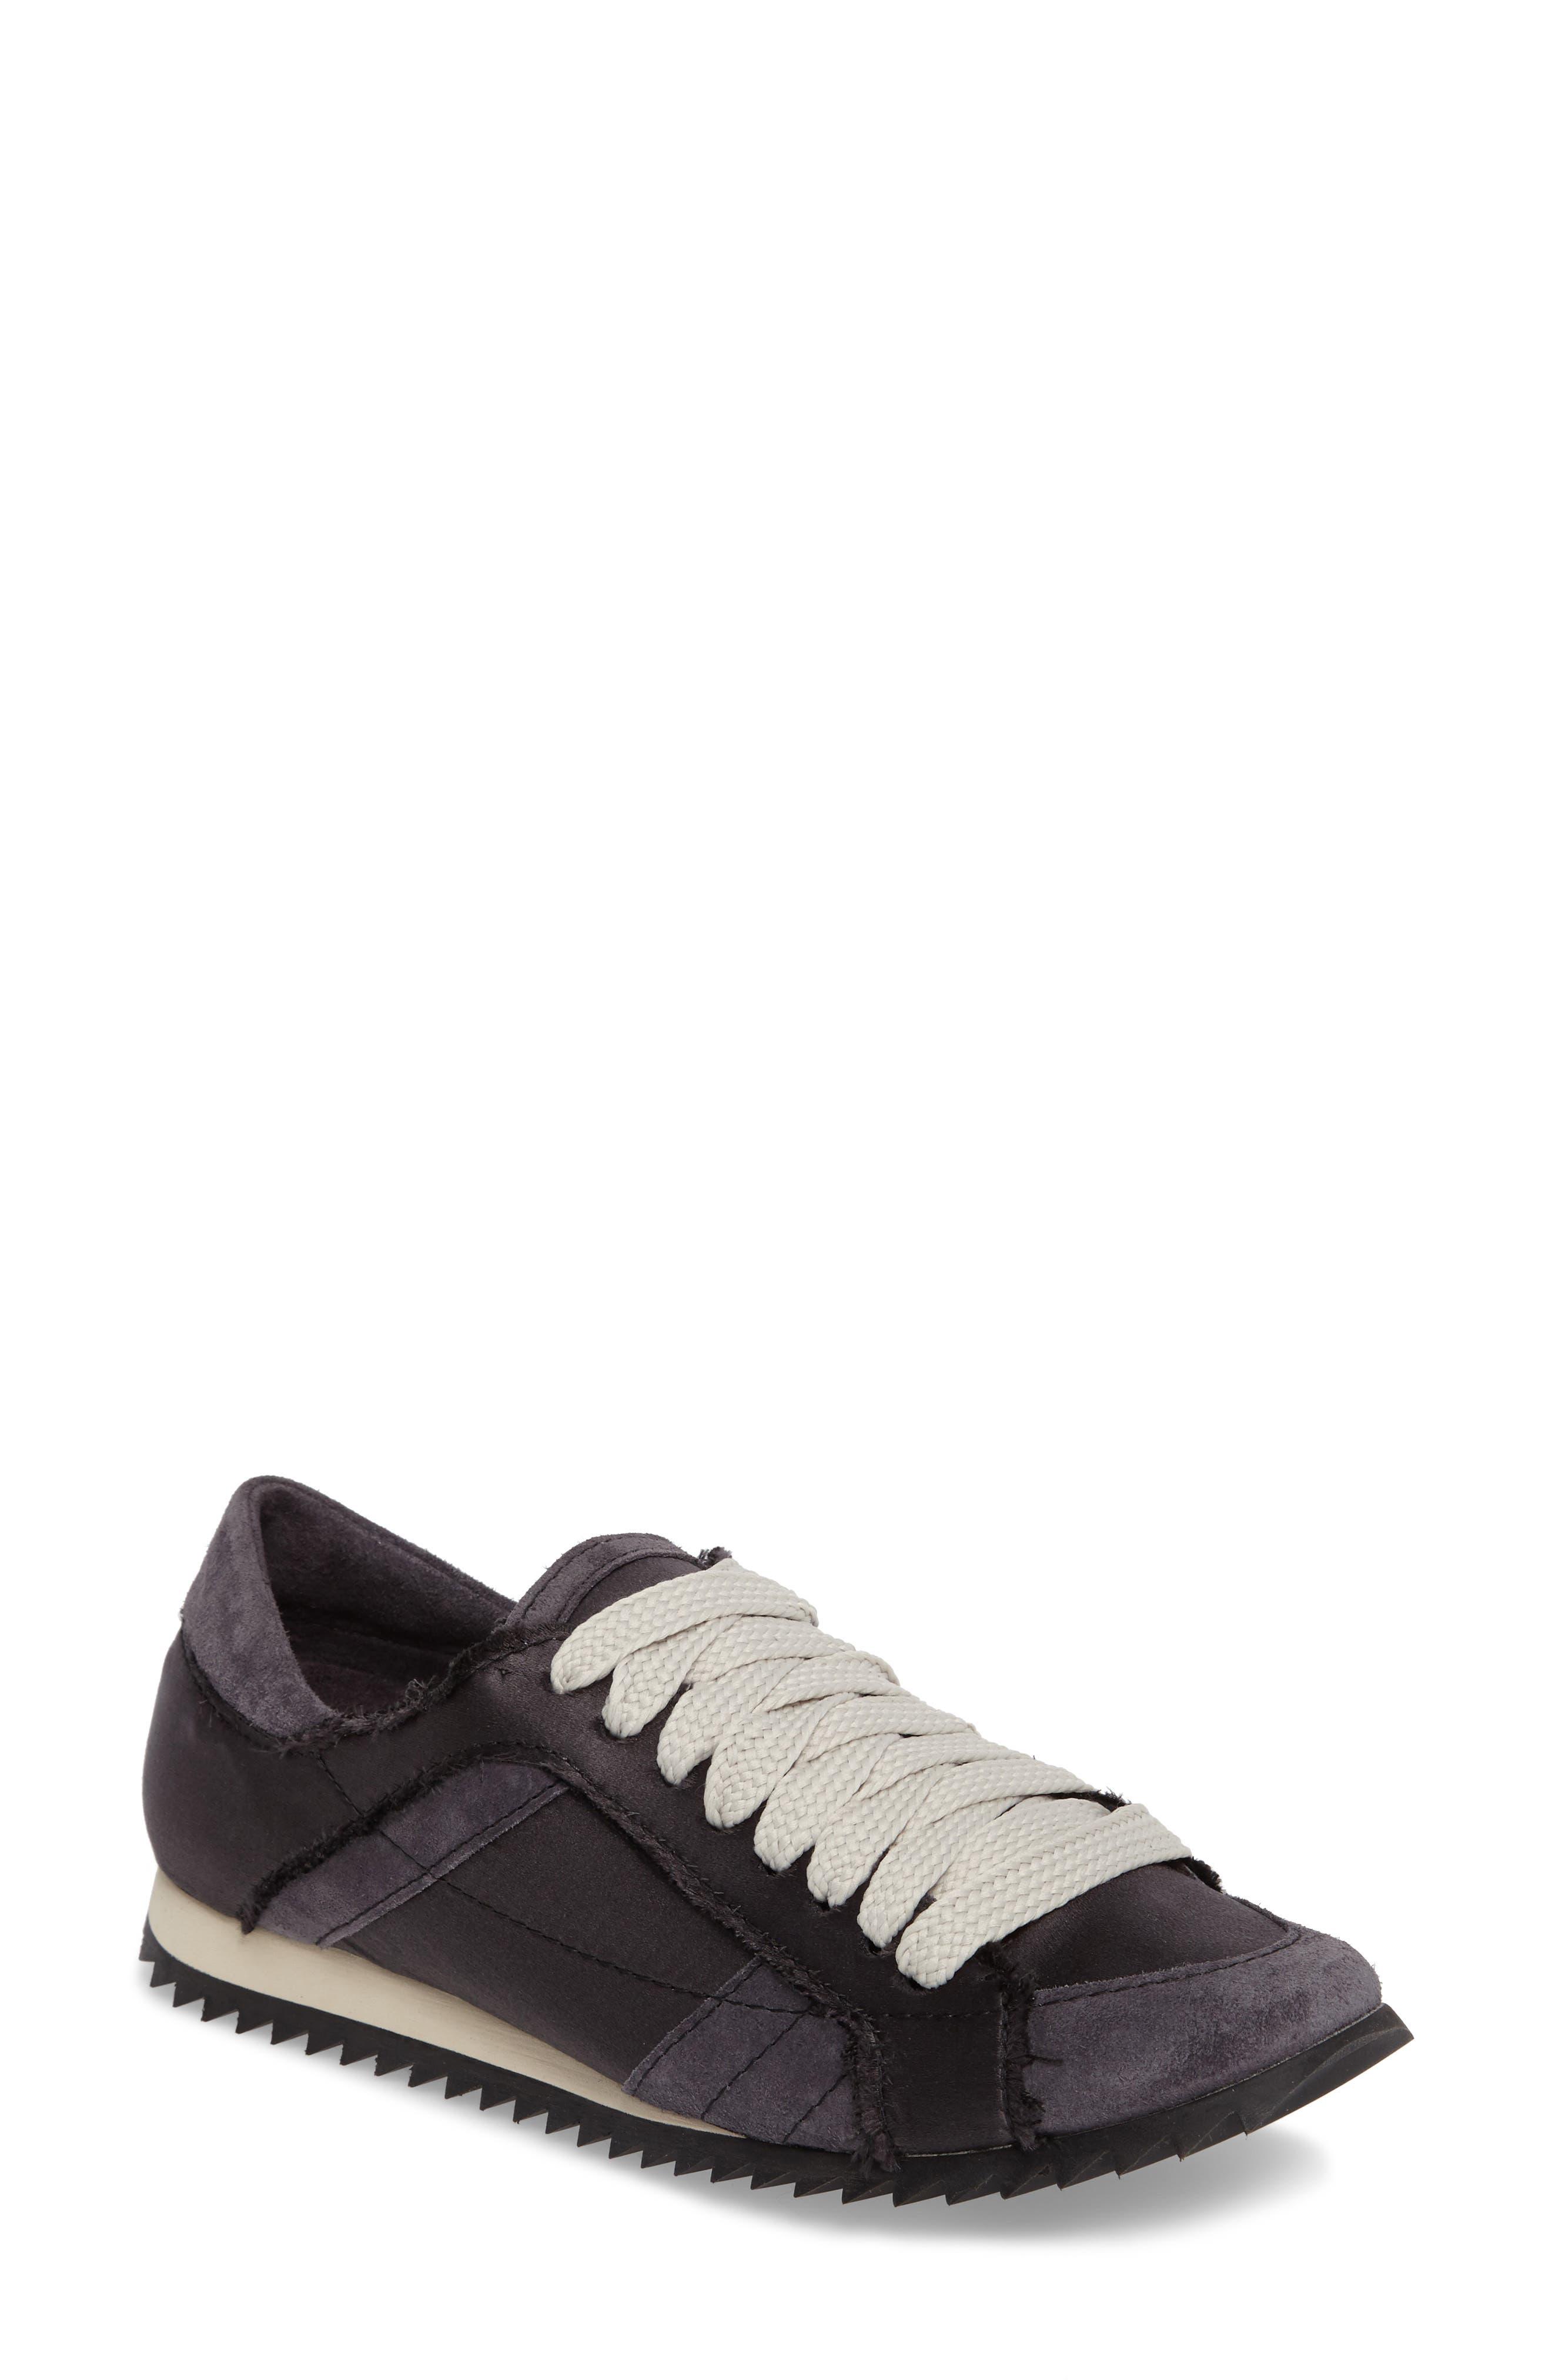 Cristina Trainer Sneaker,                             Main thumbnail 1, color,                             001